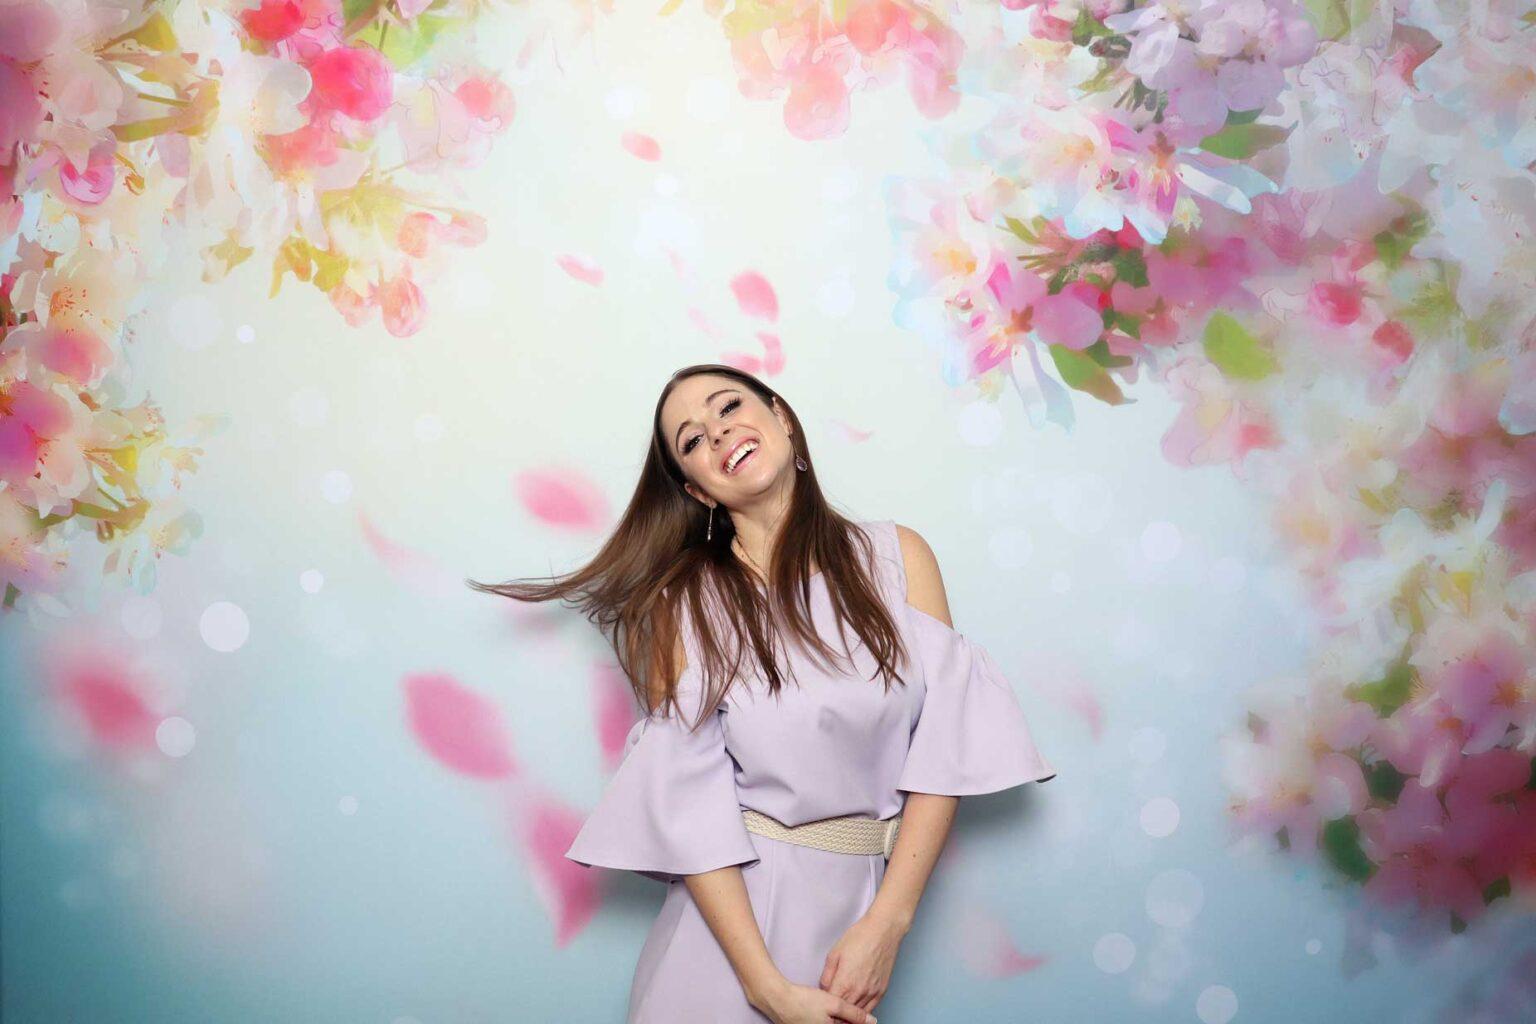 fotokutik na svadbu fotostena cherry blossom fotobox zilina FOTOKÚTIK.sk